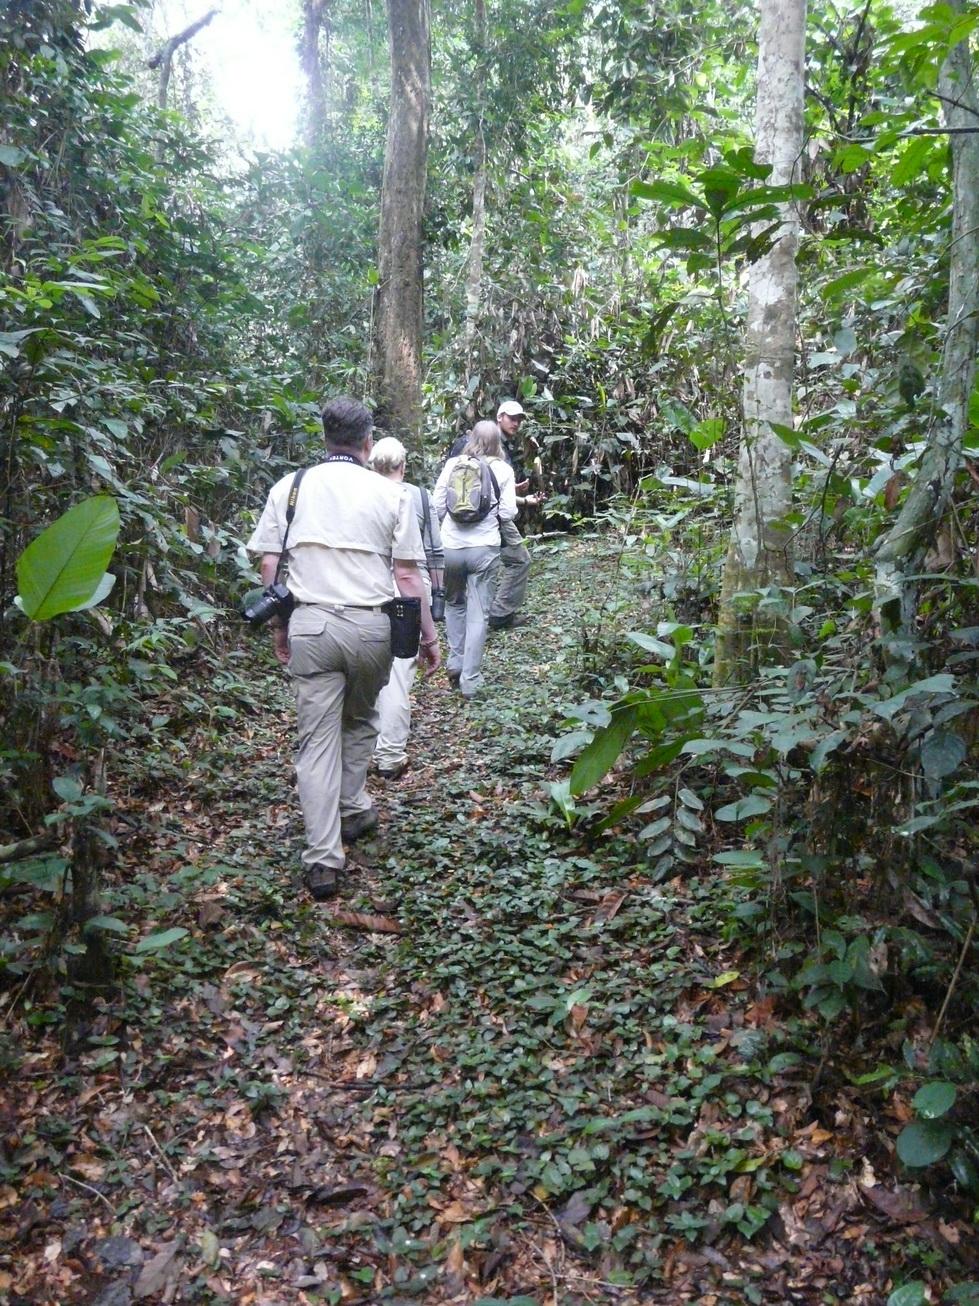 Gorilla safari in Odzala-Kokoua National Park, Congo